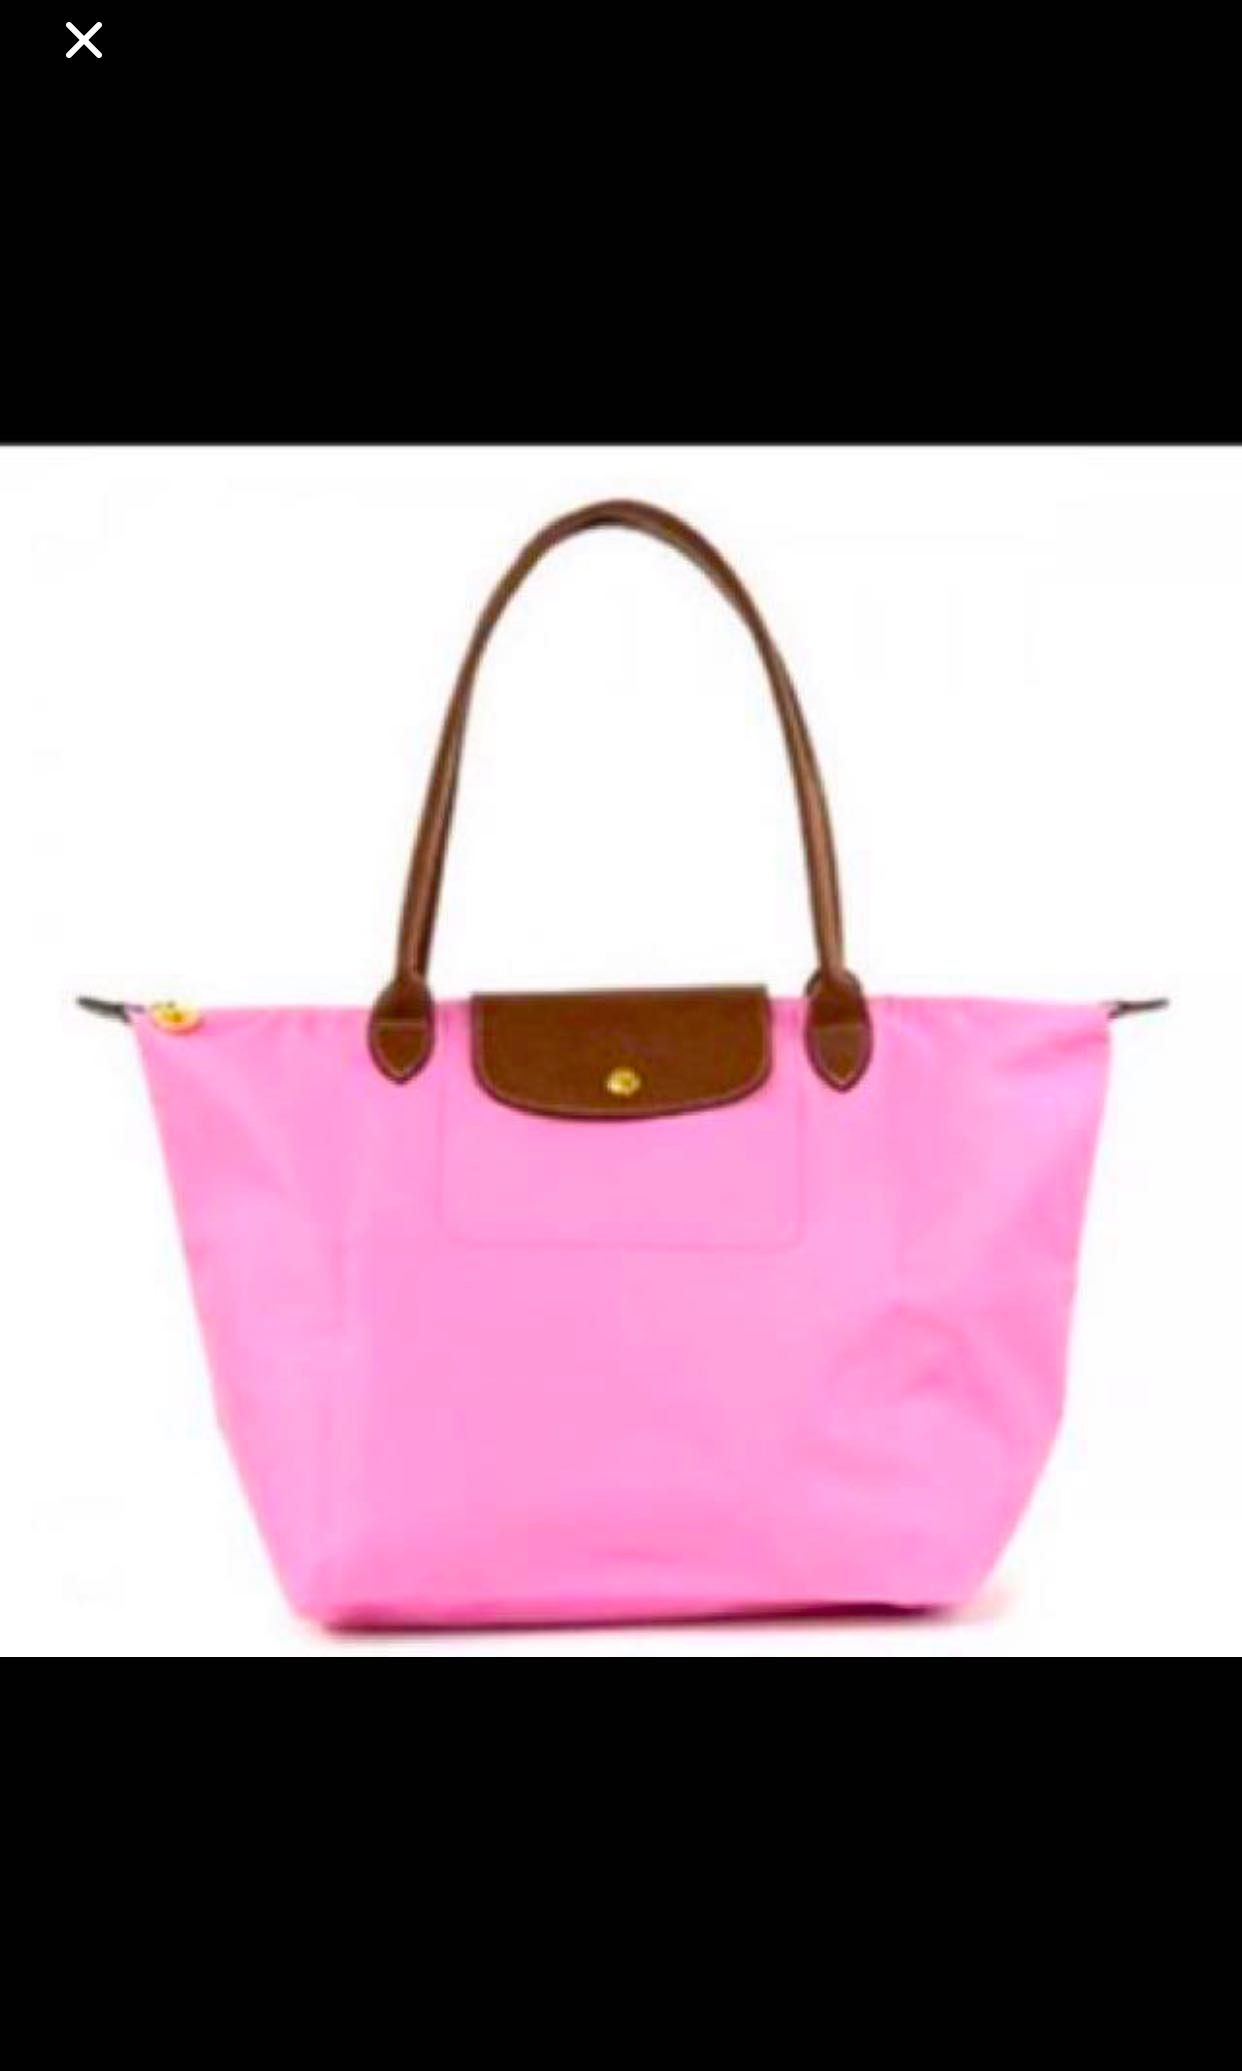 957541754fe Longchamp Handbag - Lepliage Medium (Authentic Guaranteed), Luxury ...